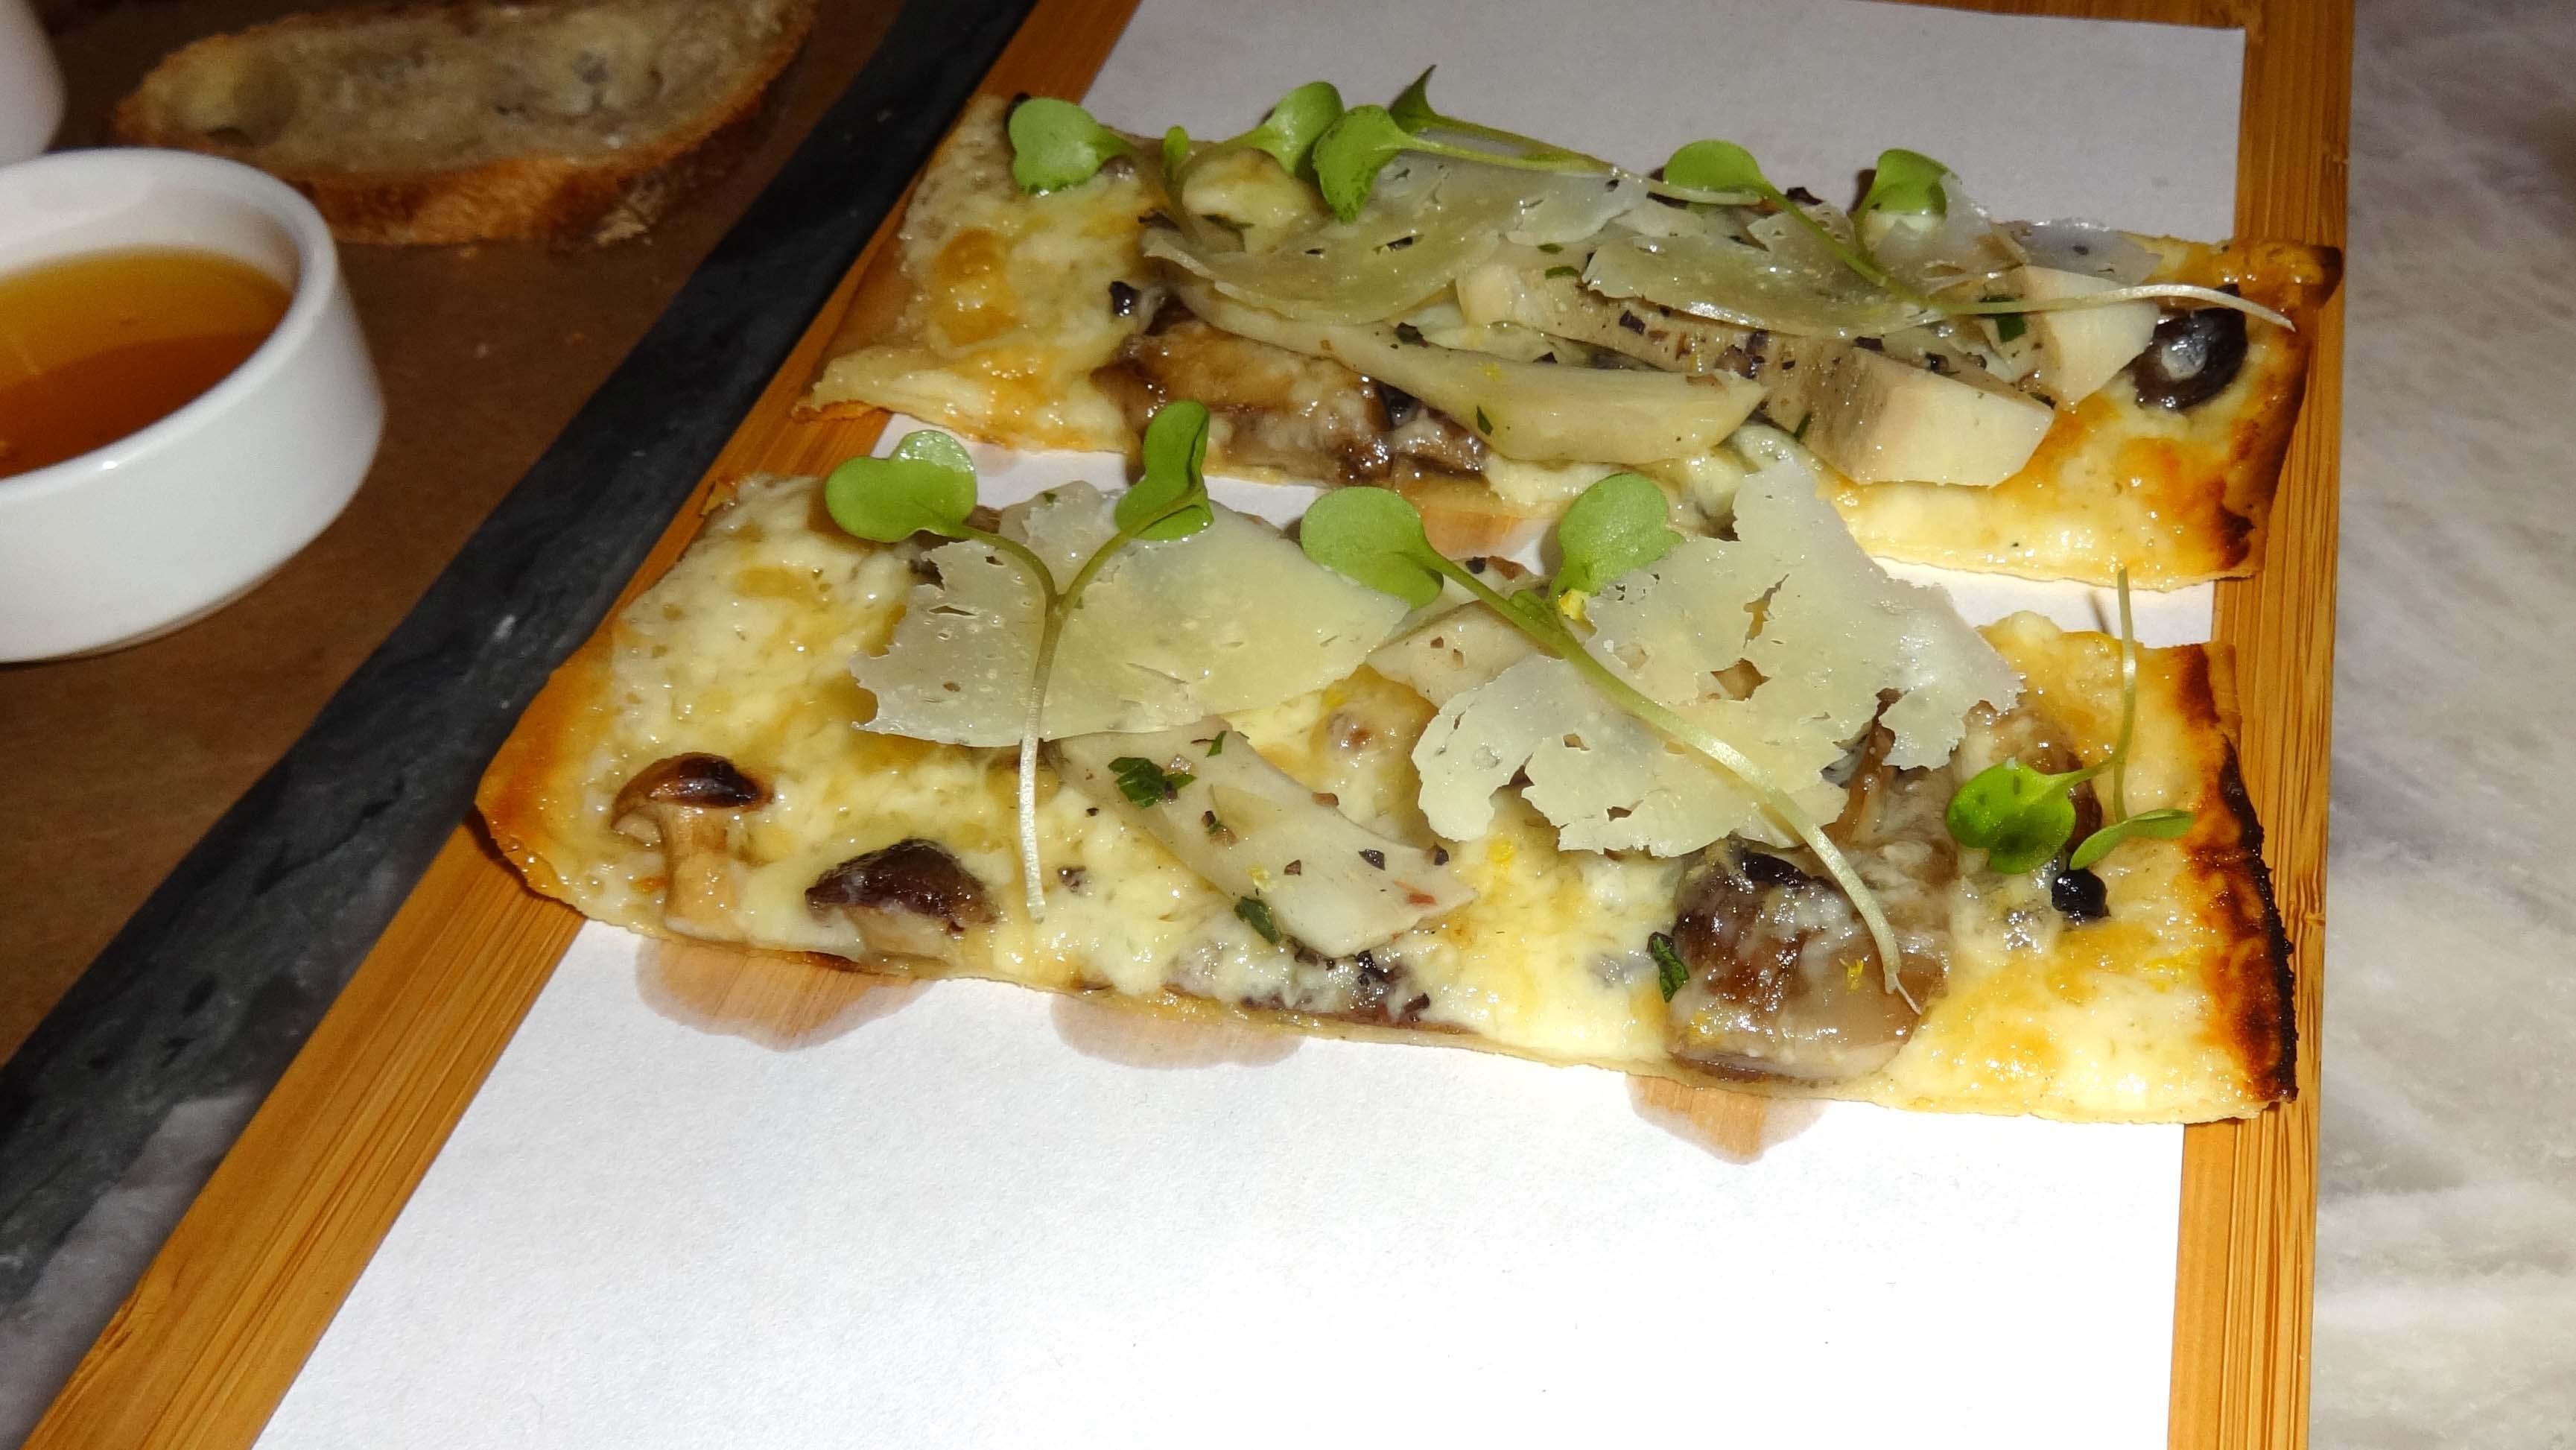 Amada artichoke bread